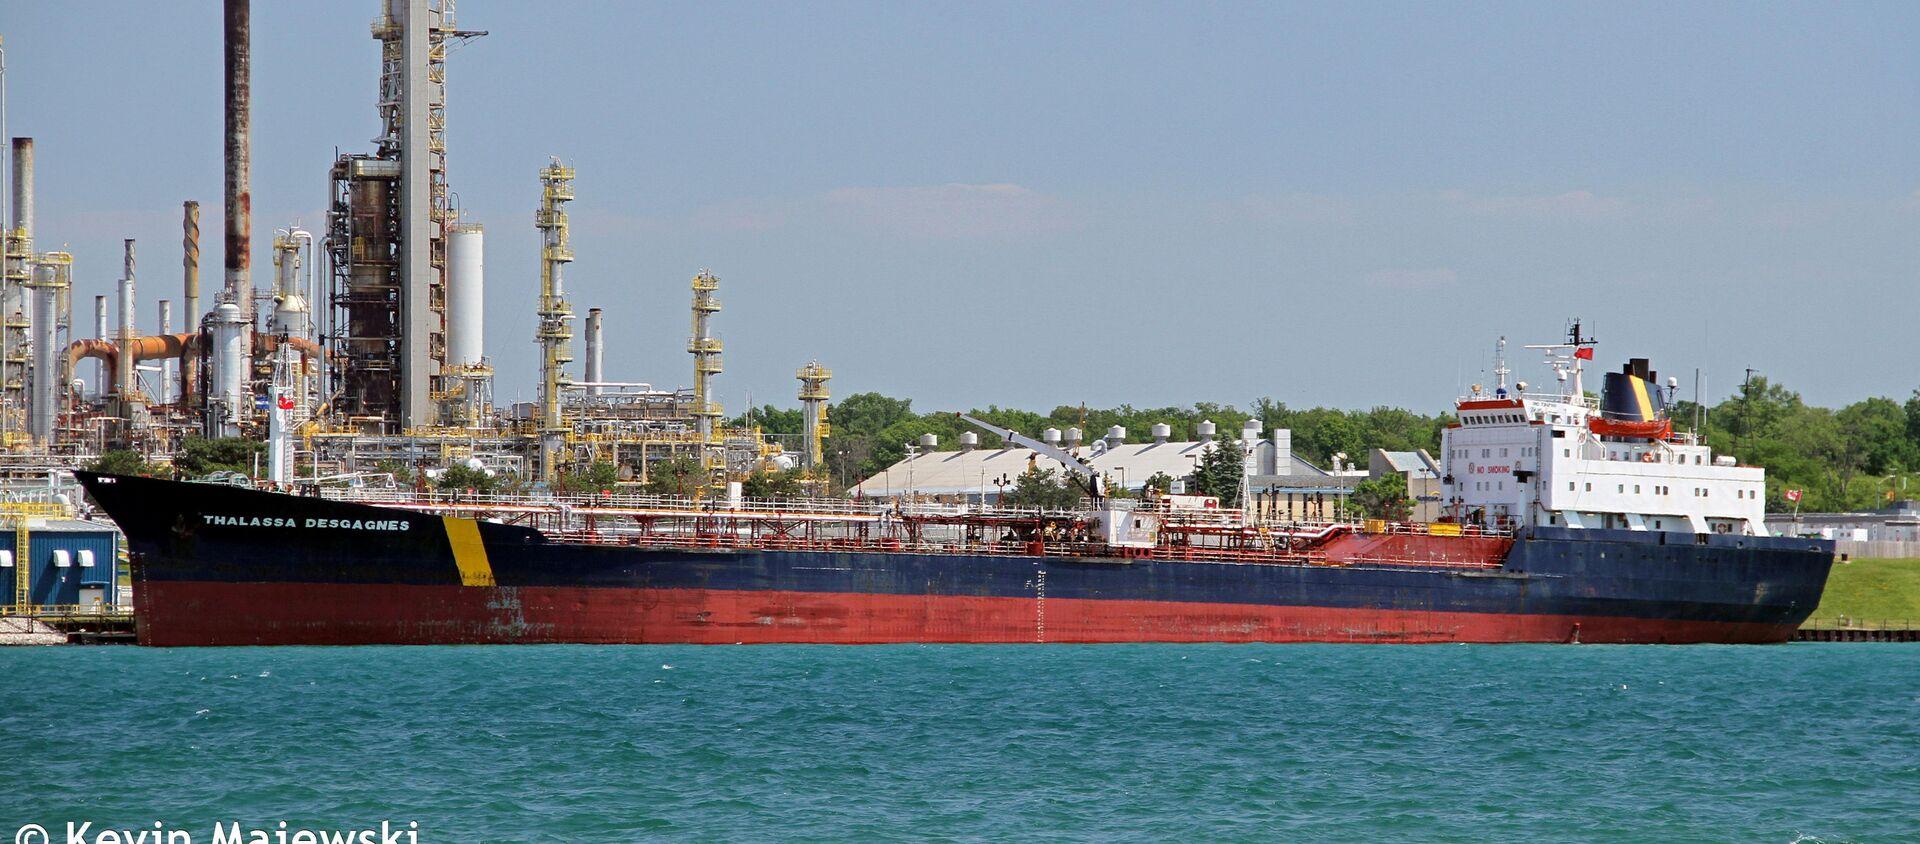 A handout image shows the Thalassa Desgagnes tanker, now called the Asphalt Princess, in Sarnia, Ontario, Canada June 19, 2016. - Sputnik International, 1920, 04.08.2021